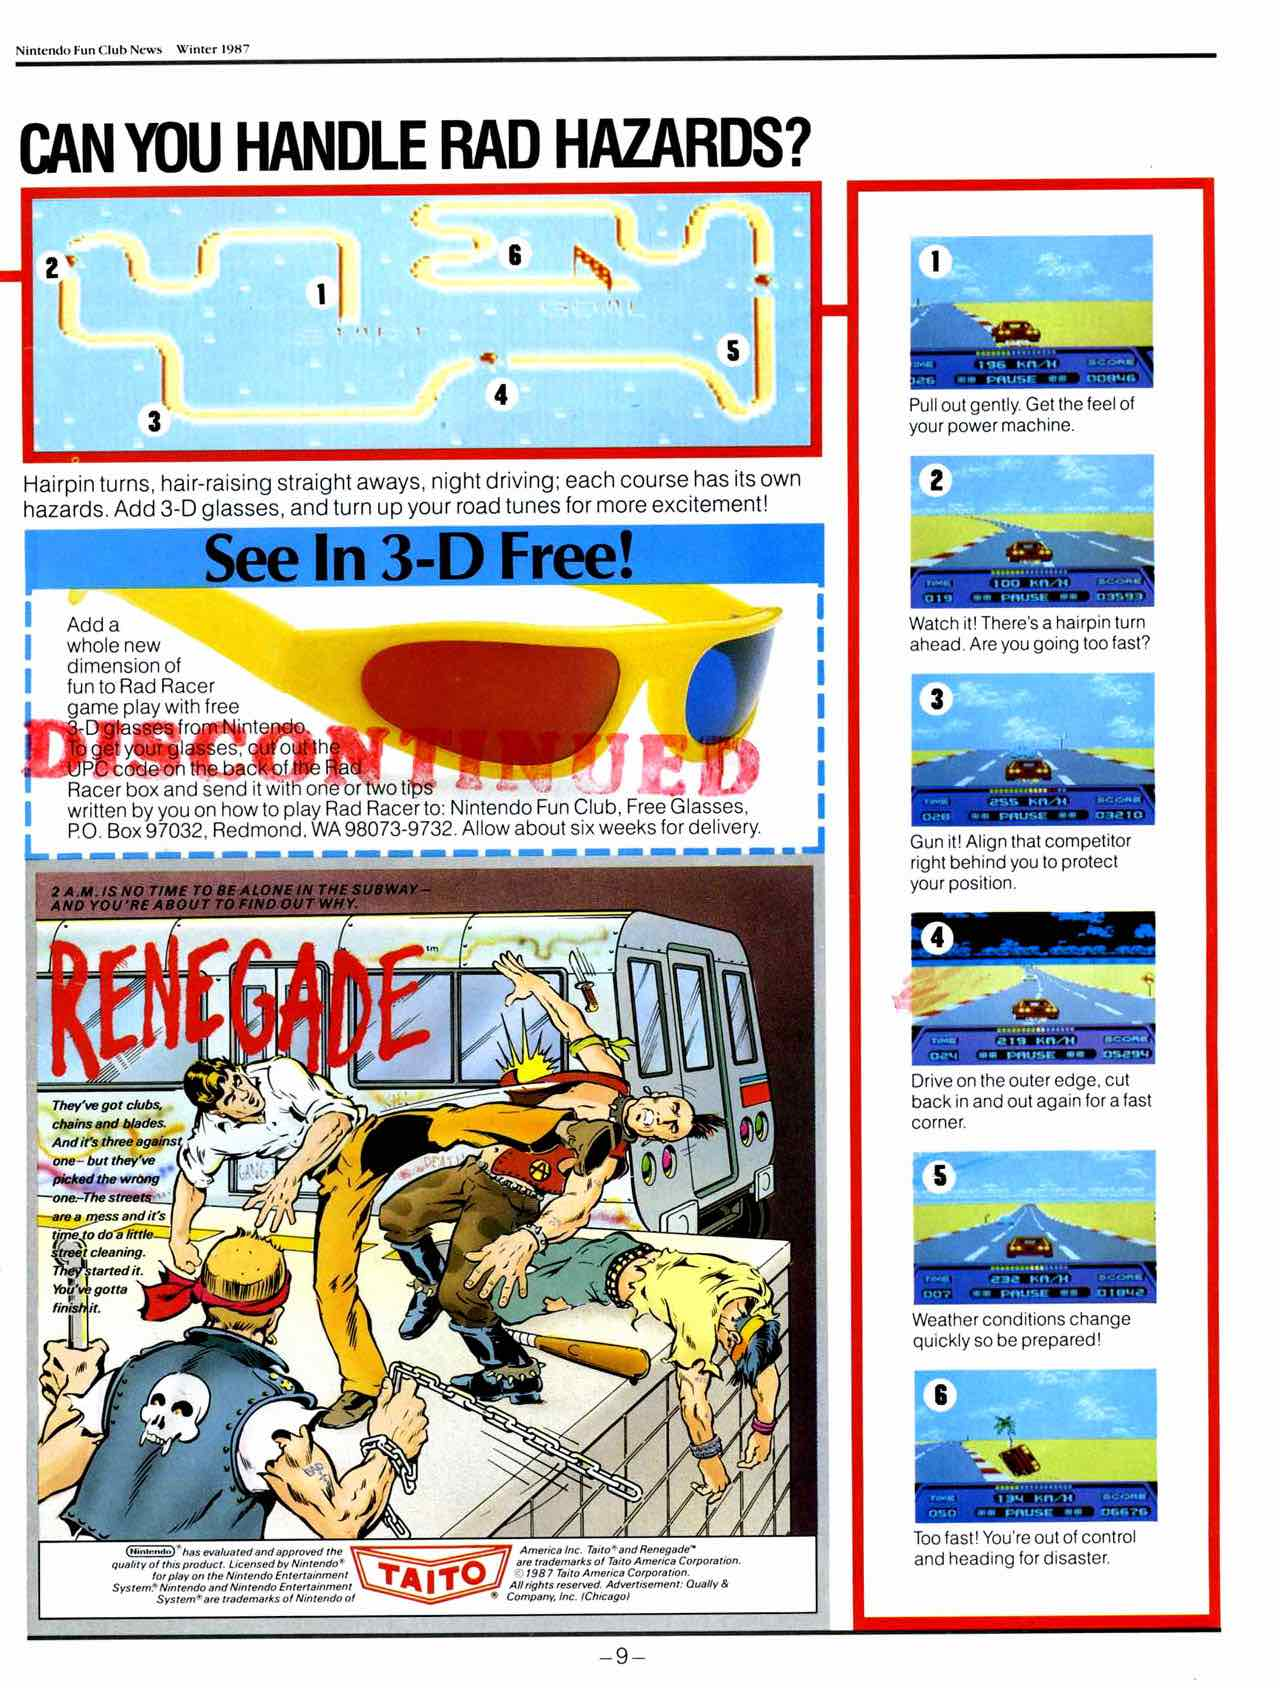 NIntendo Fun Club News | Winter 1987 - 9